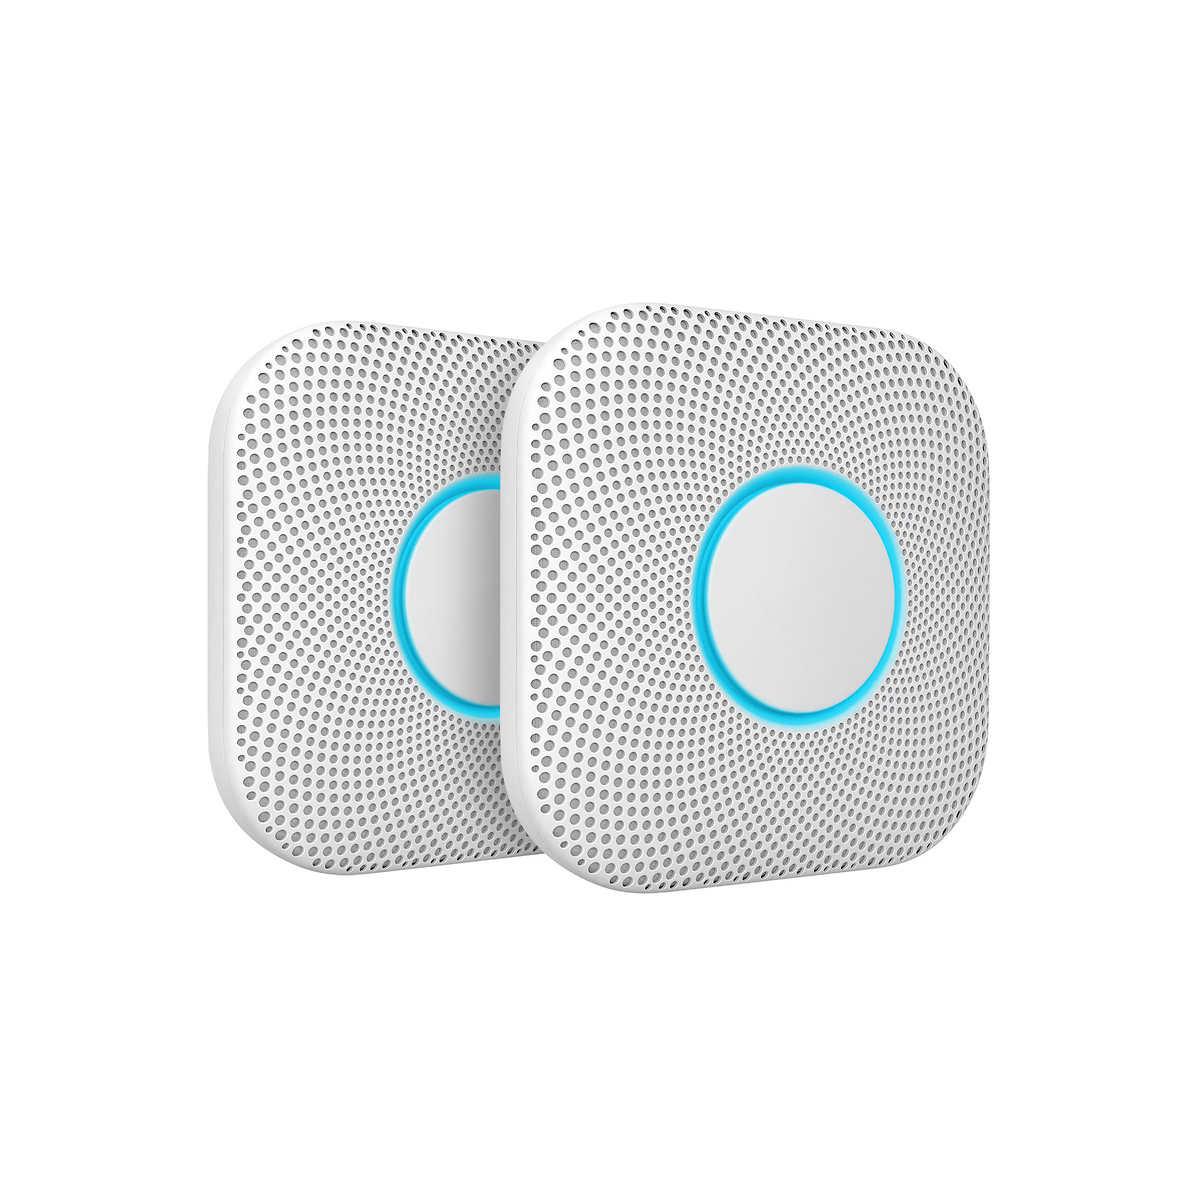 Google Nest Protect Smoke Alarm And Carbon Monoxide Detector